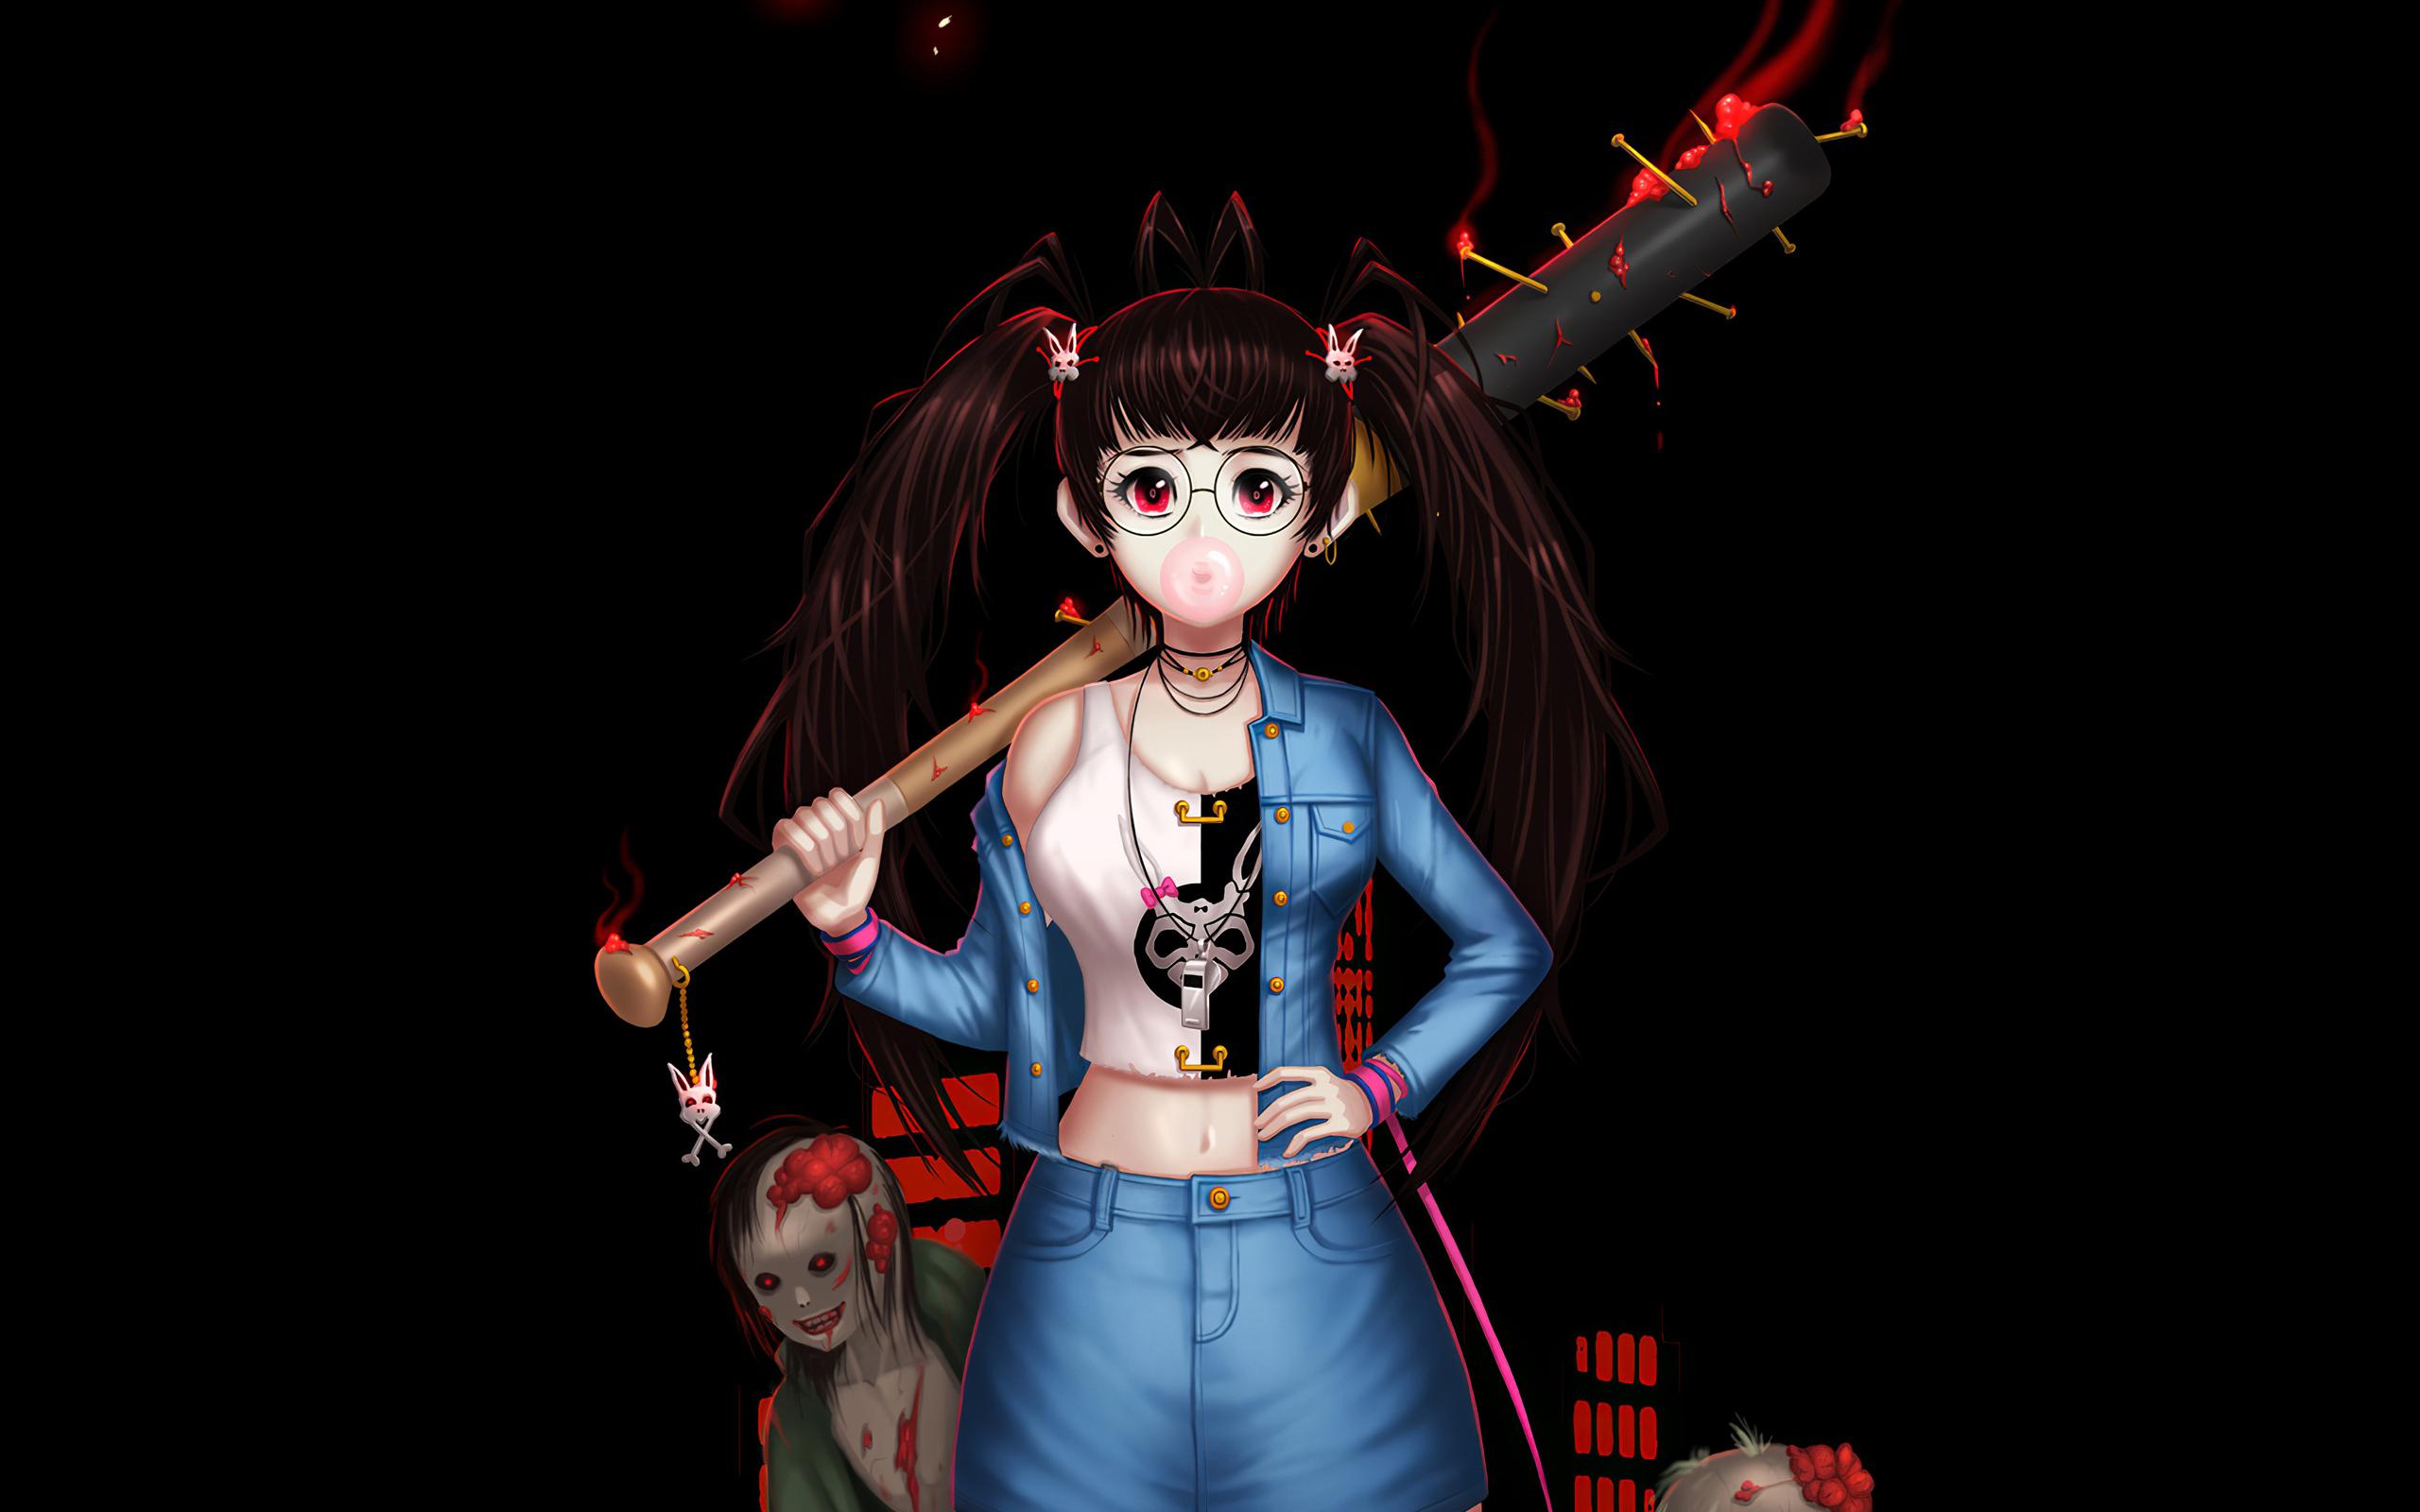 zombie-fighter-girl-4k-jj.jpg